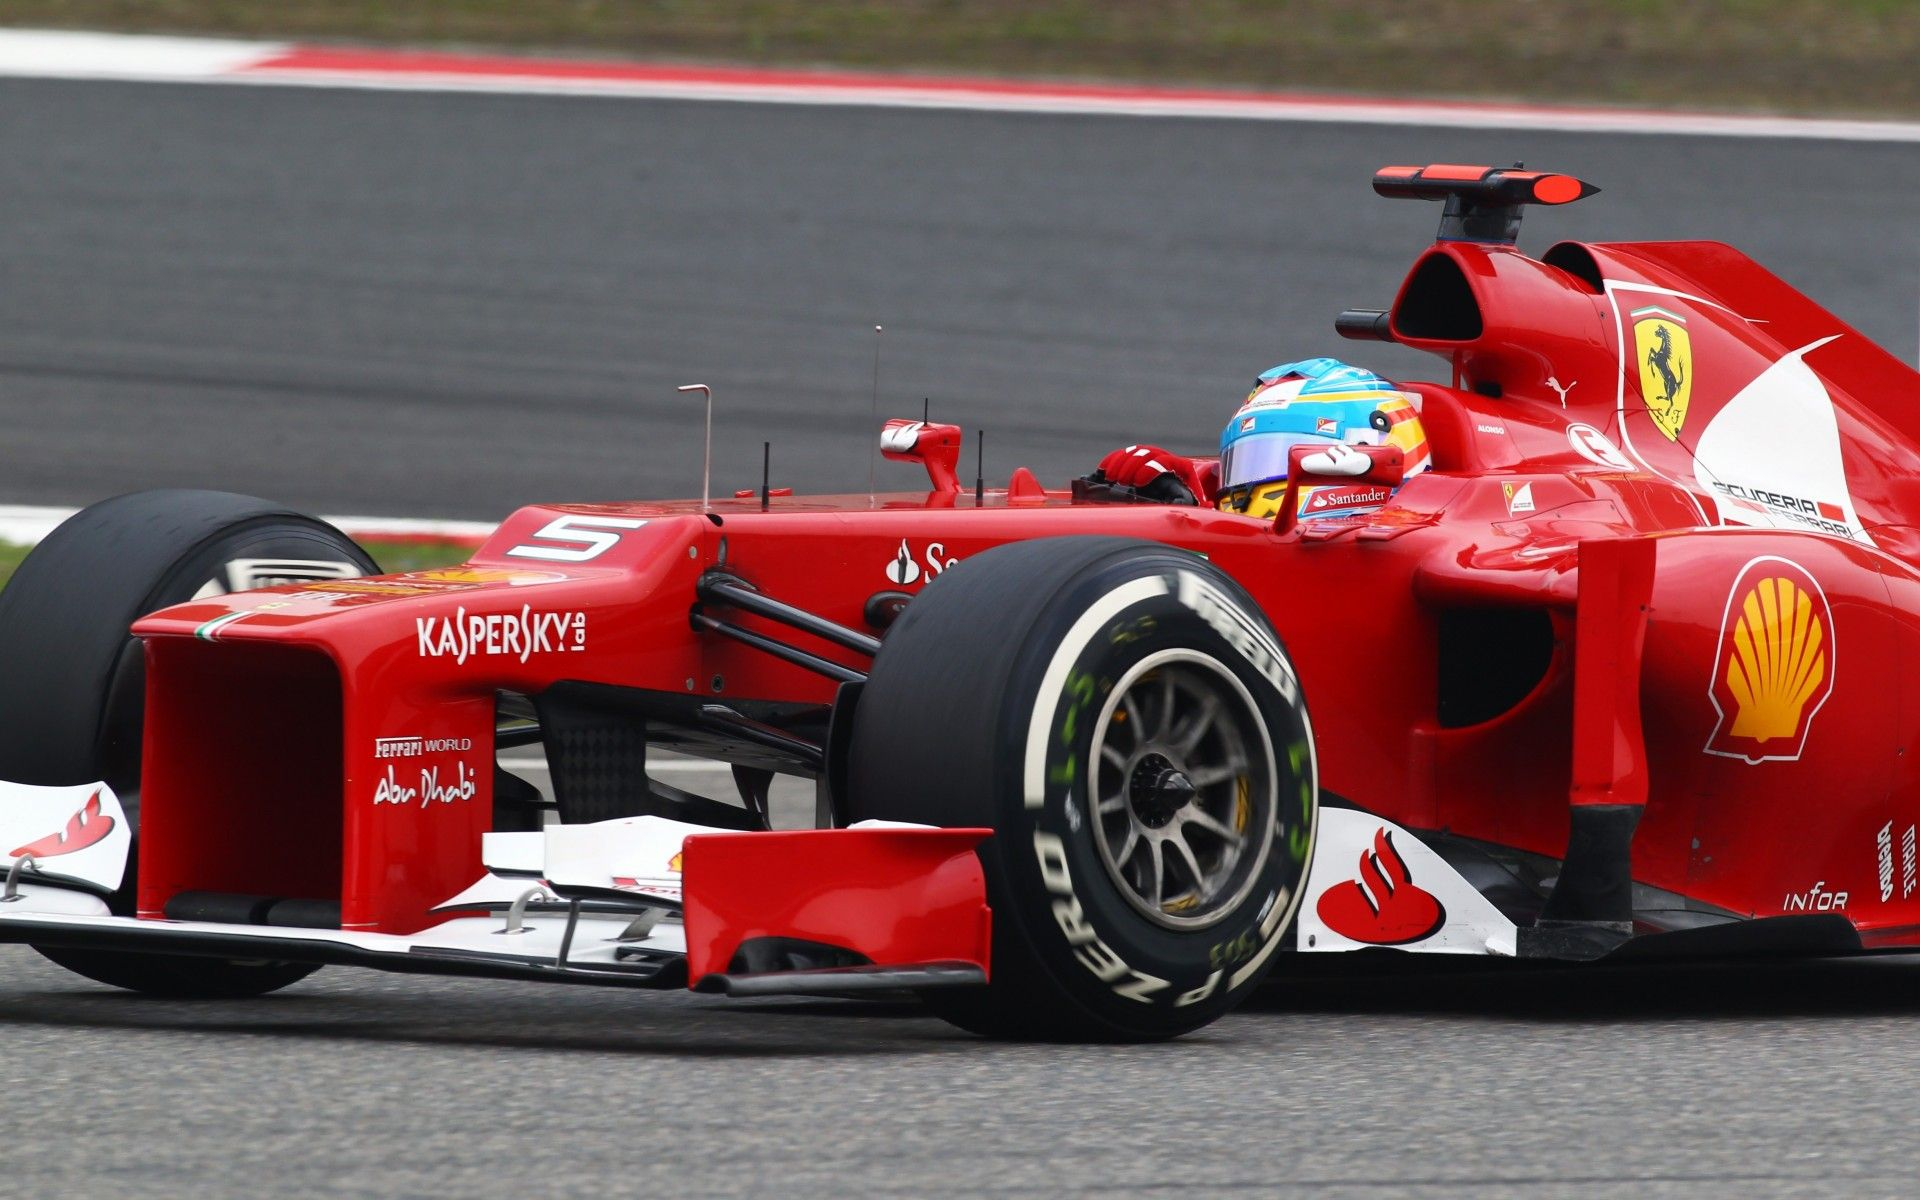 F Cars Wallpapers Ferrari F Cars Wallpaper Nano Trunk